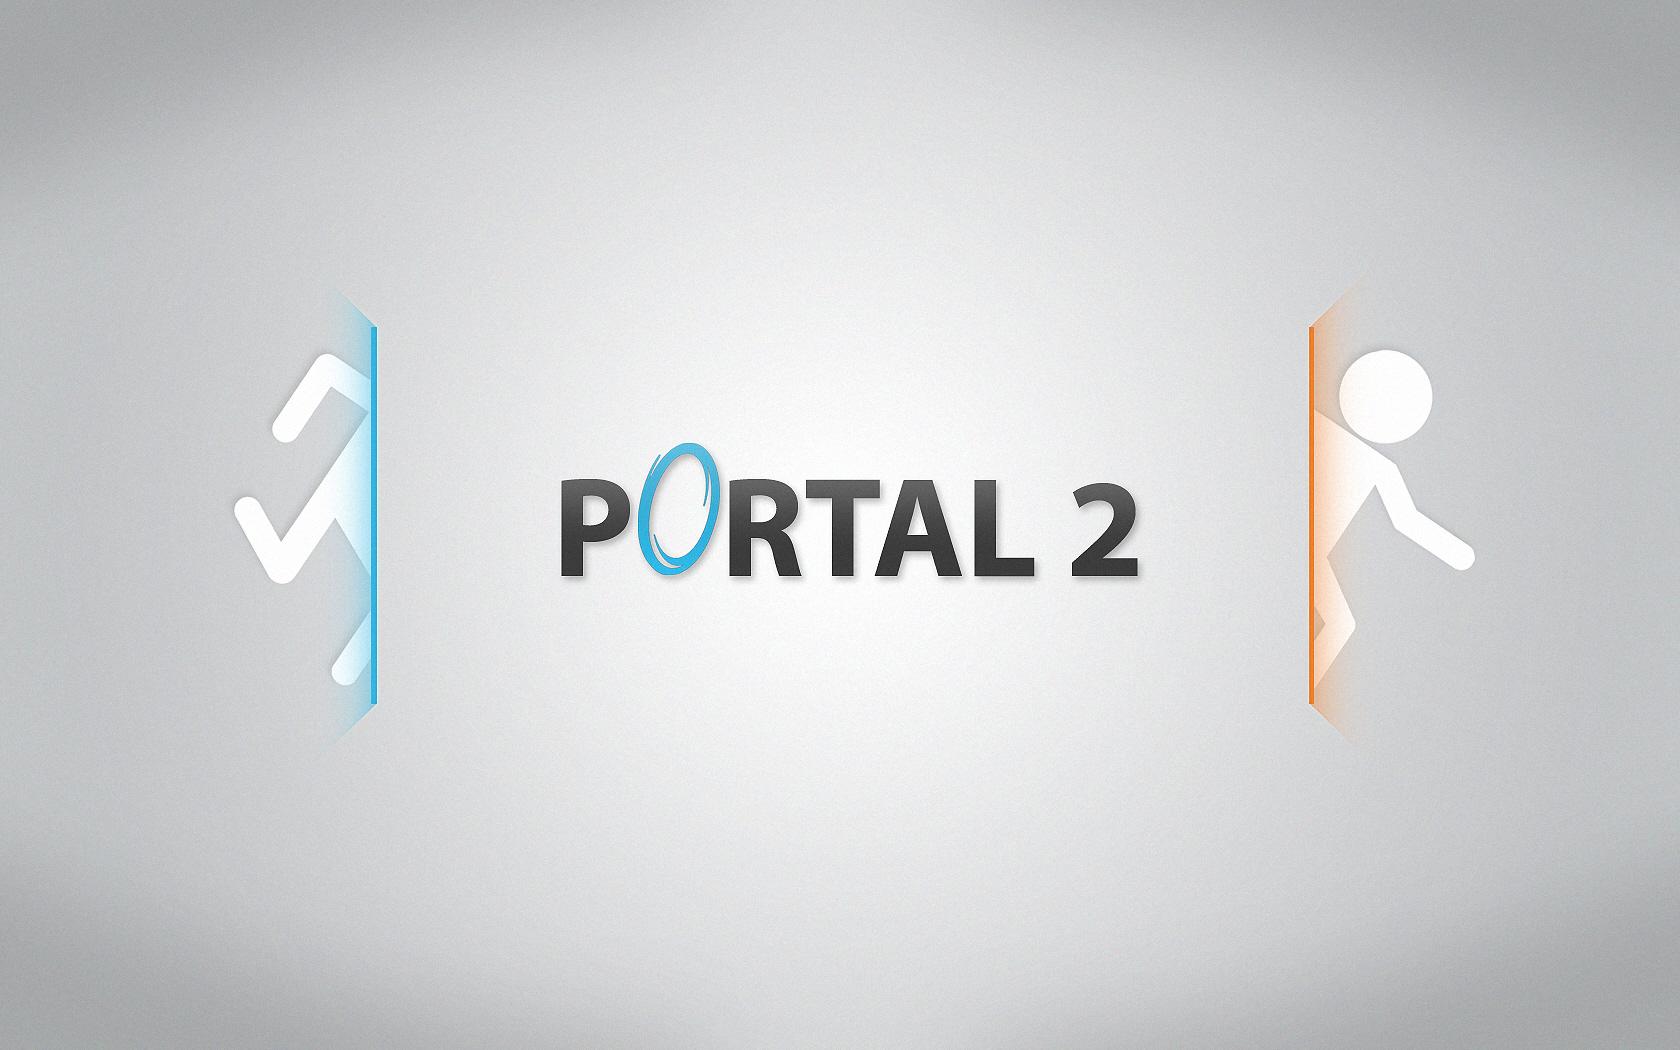 Portal 2 White Logo Is Awesome